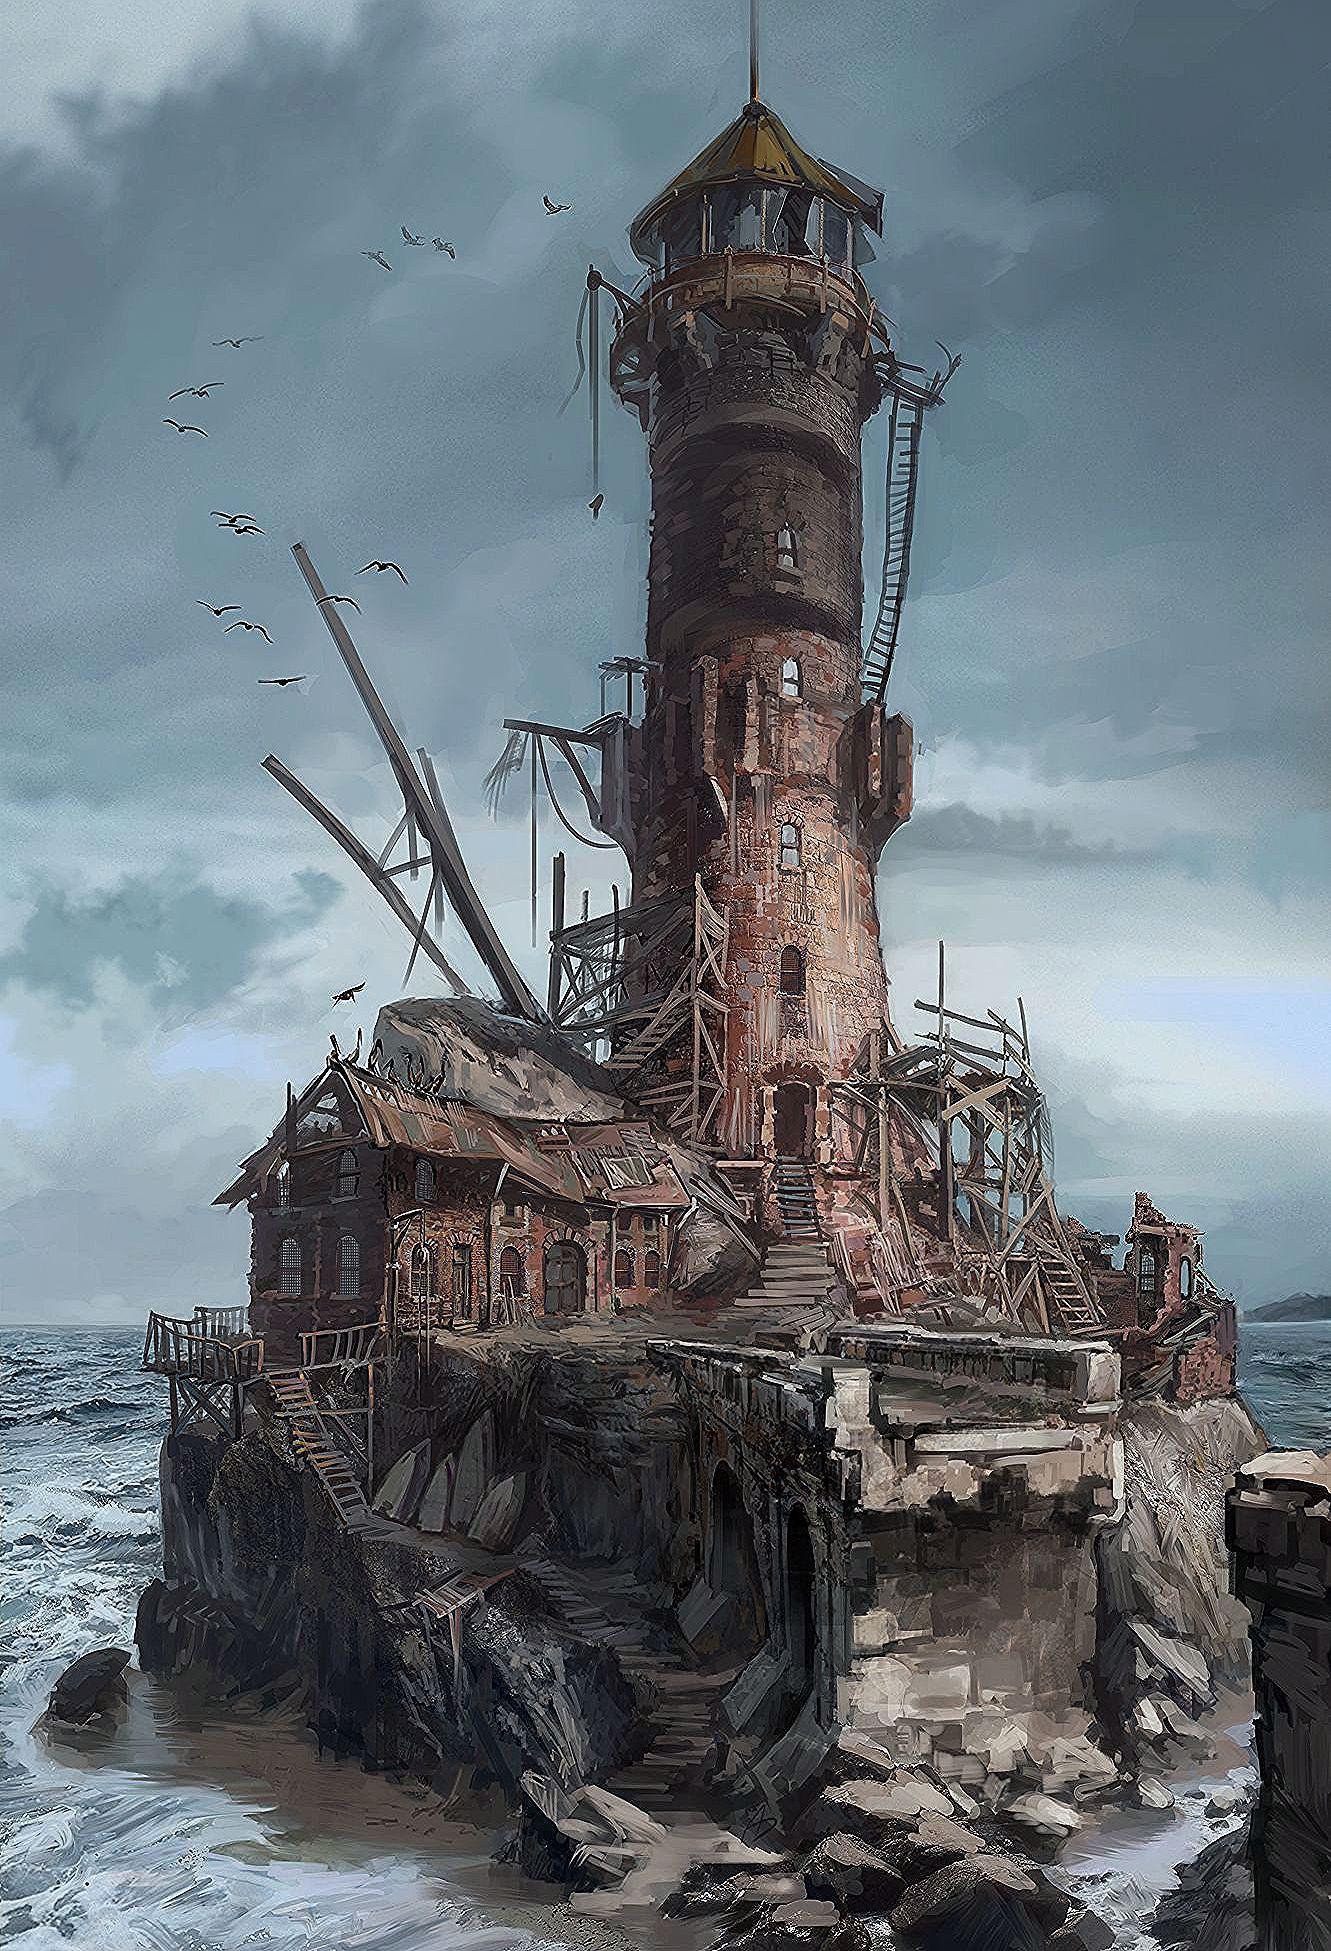 Reefwatch_Lighthouse.jpg